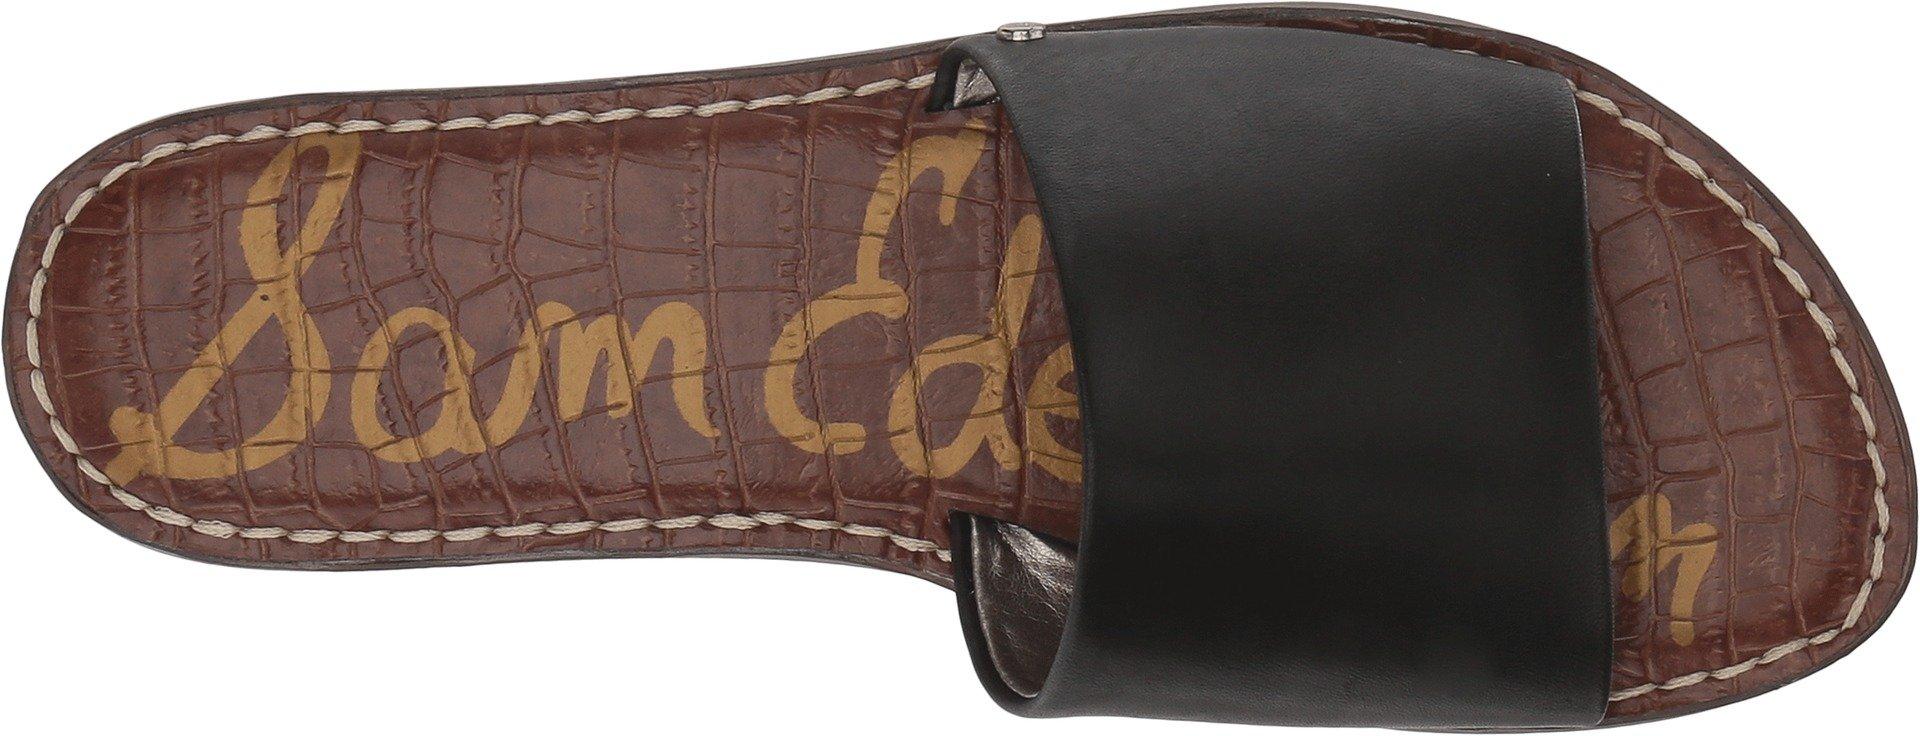 Sam Edelman Women's Gio Black Antanado Leather 7.5 M US by Sam Edelman (Image #2)